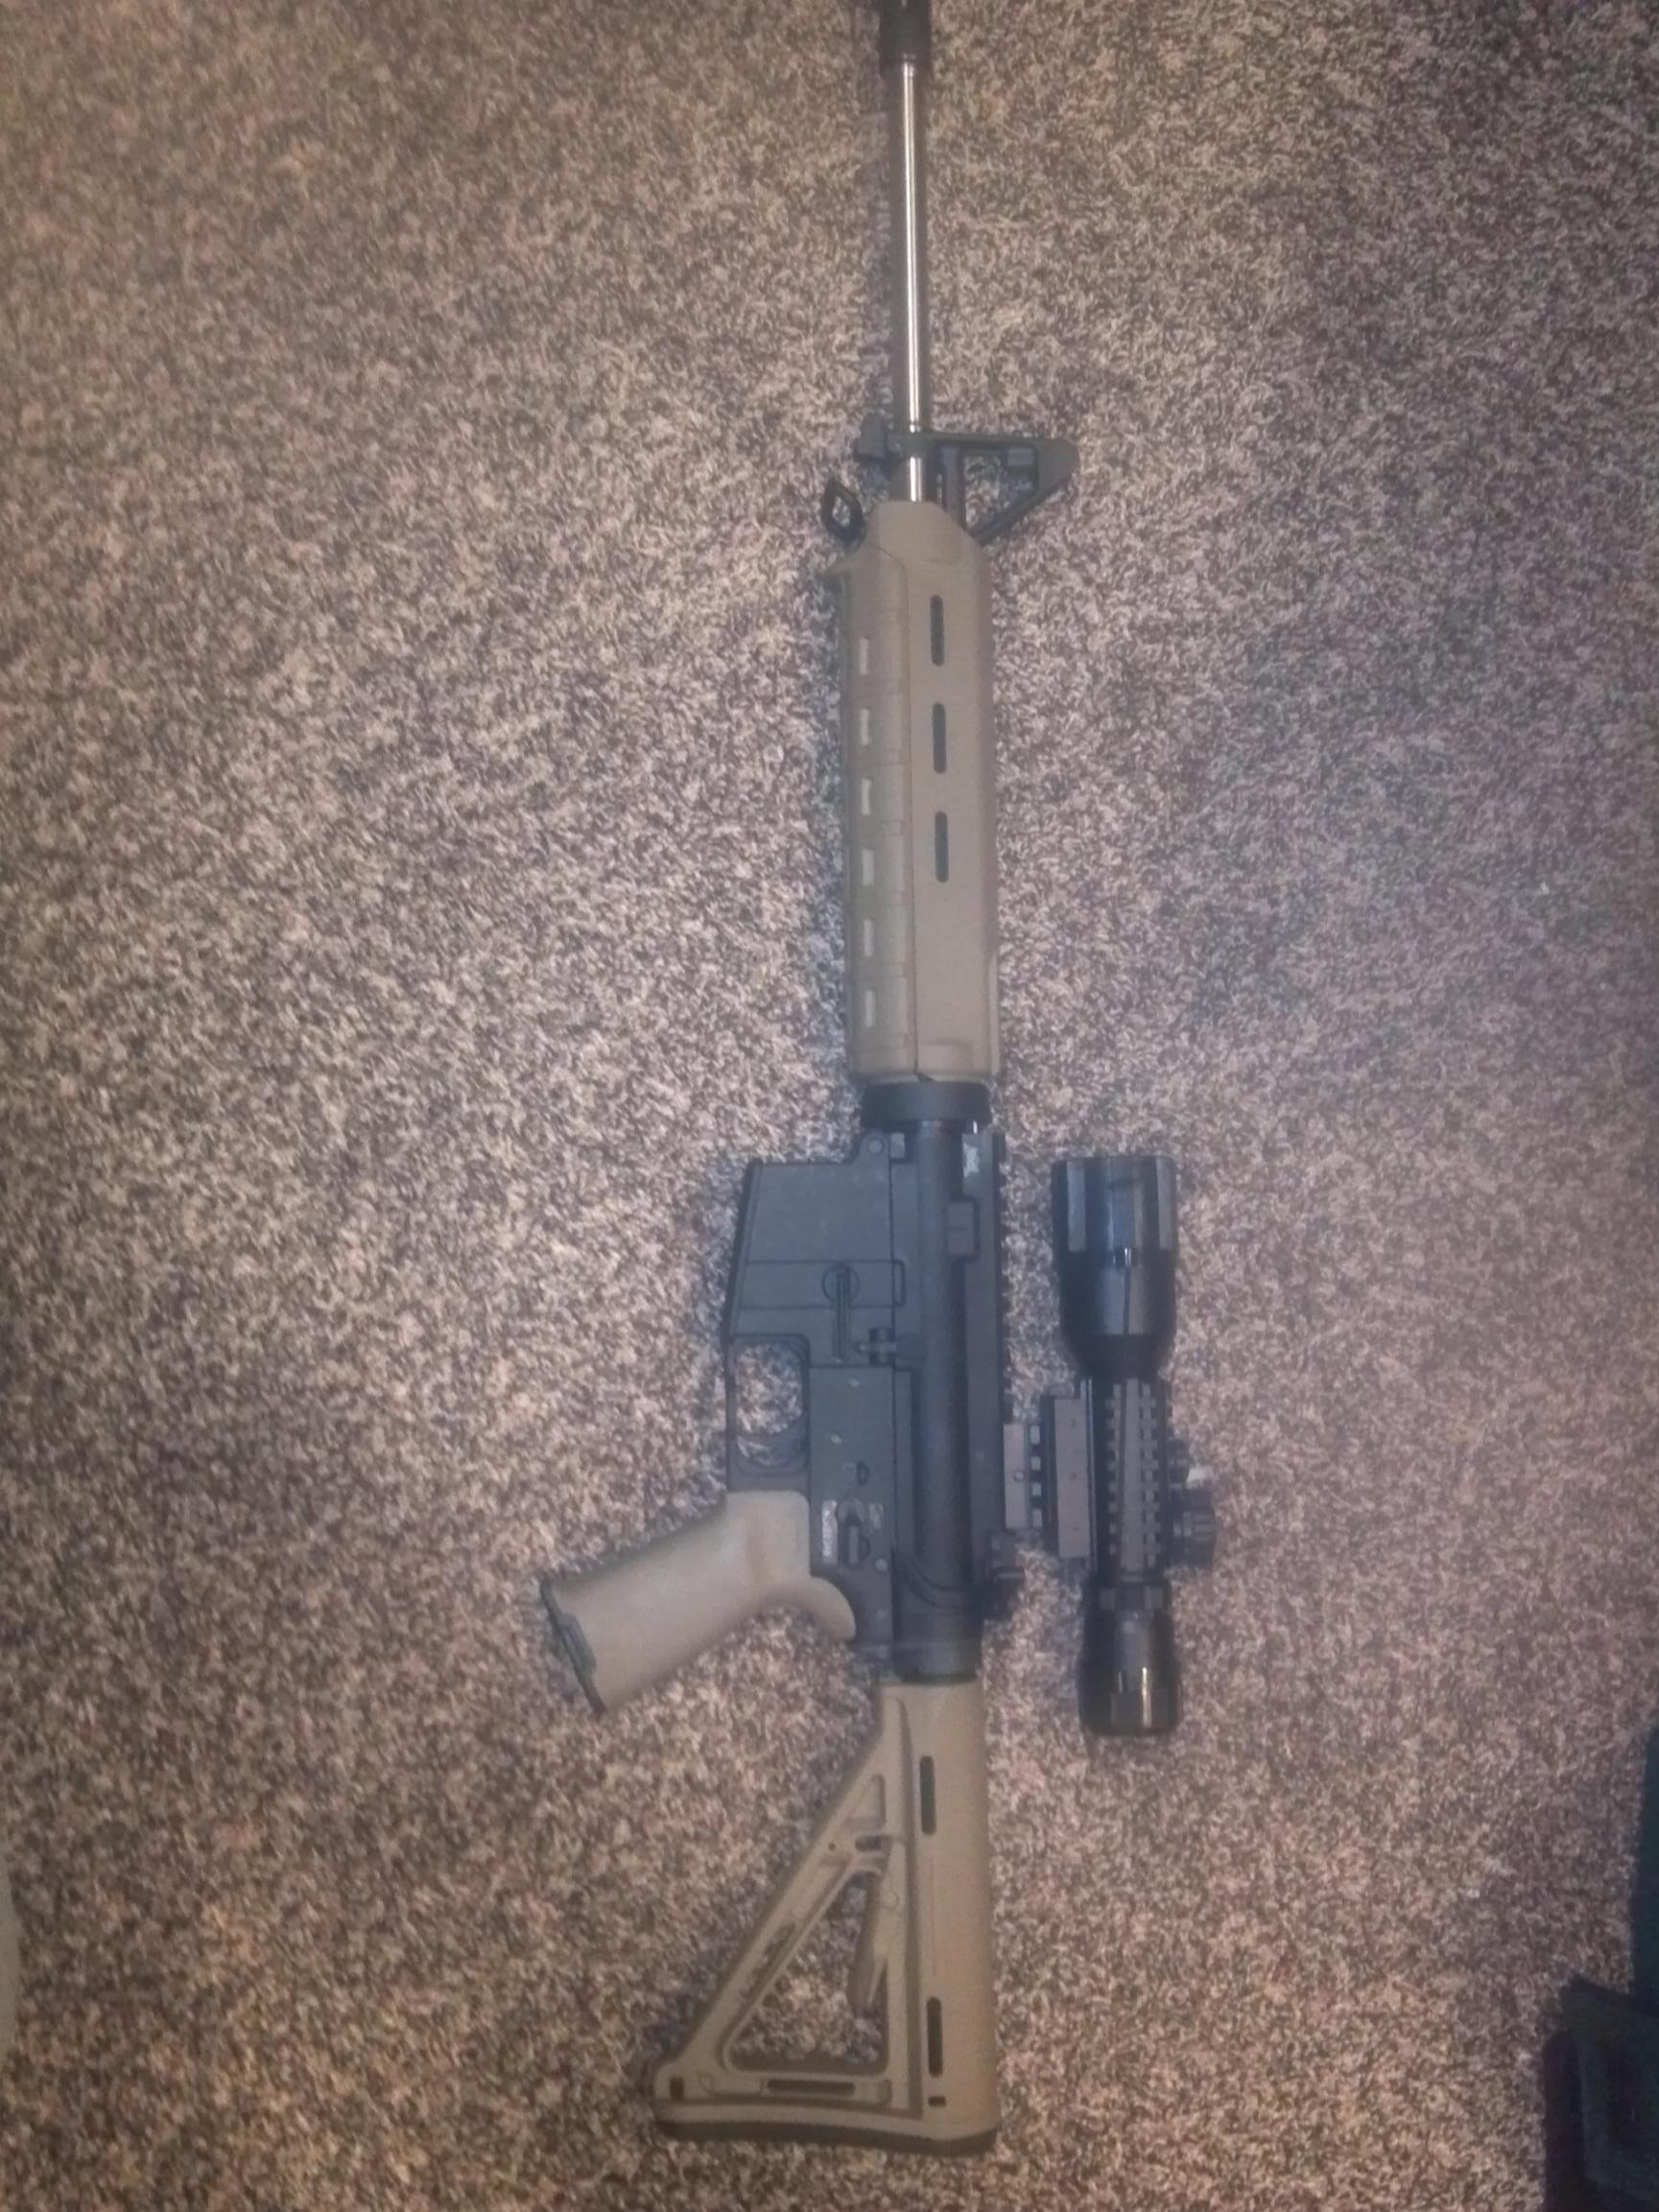 Contemplating .300 Blackout AR-15 build-2013-05-02_21-09-37_937.jpg